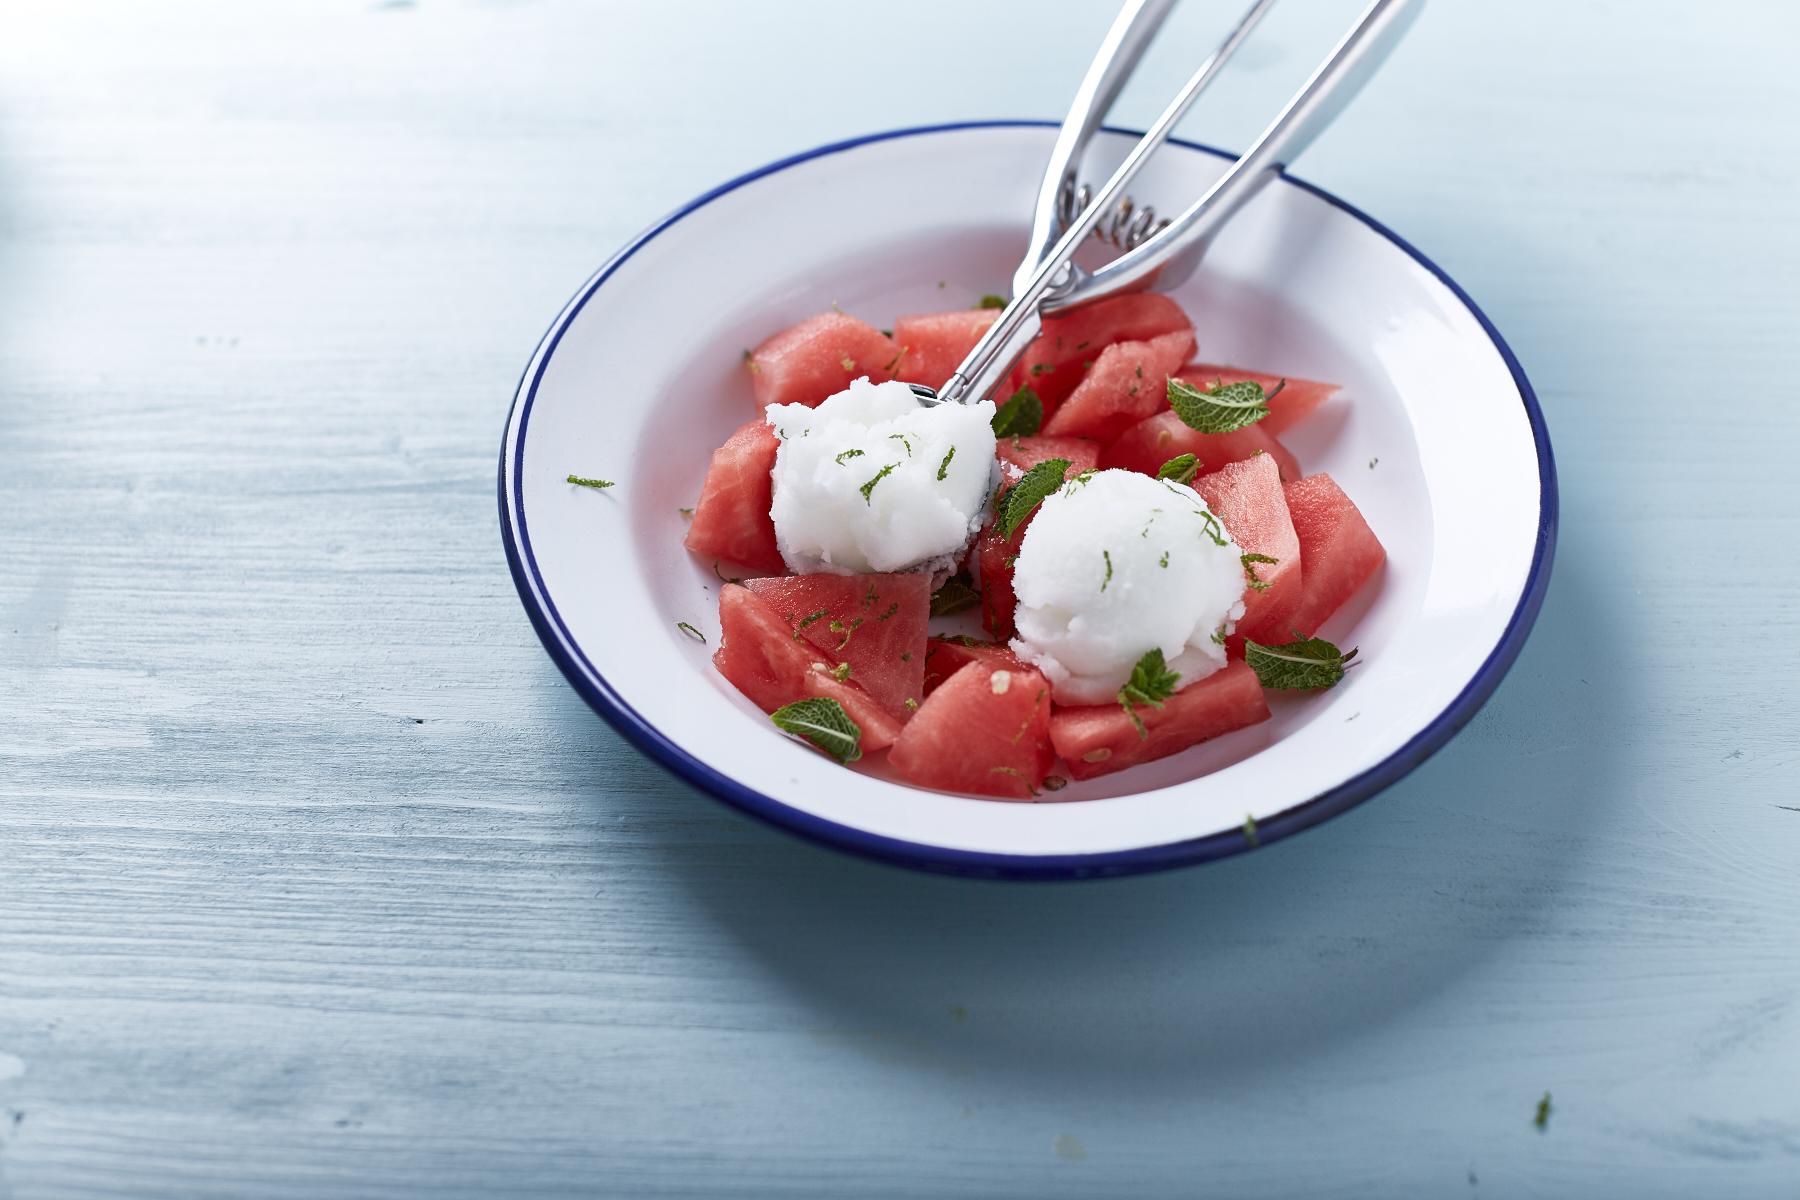 WassermelonenSorbe